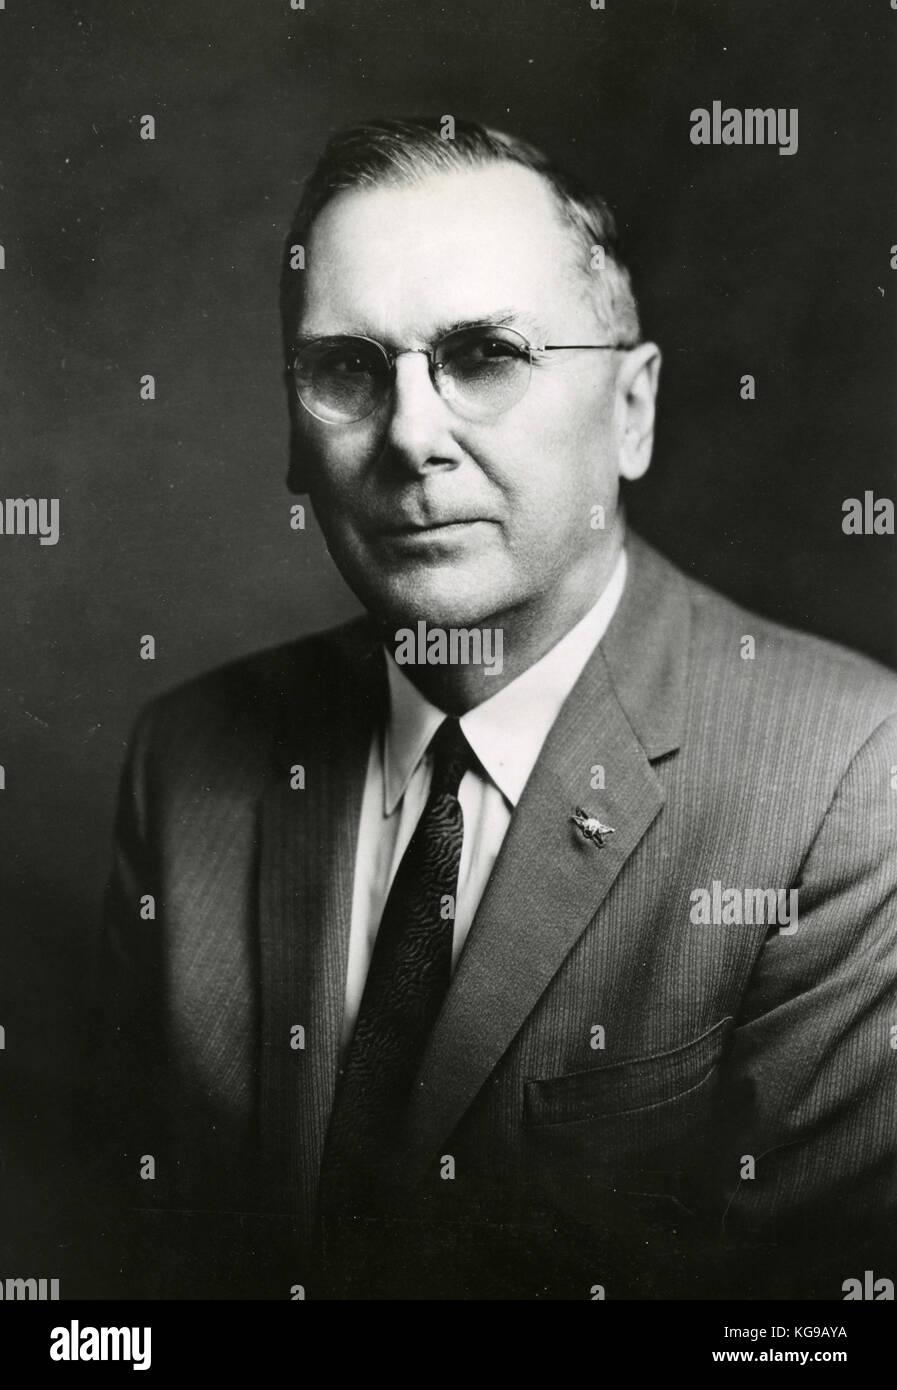 Prof. Hugh Dryden, Deputy Director at NASA - Stock Image